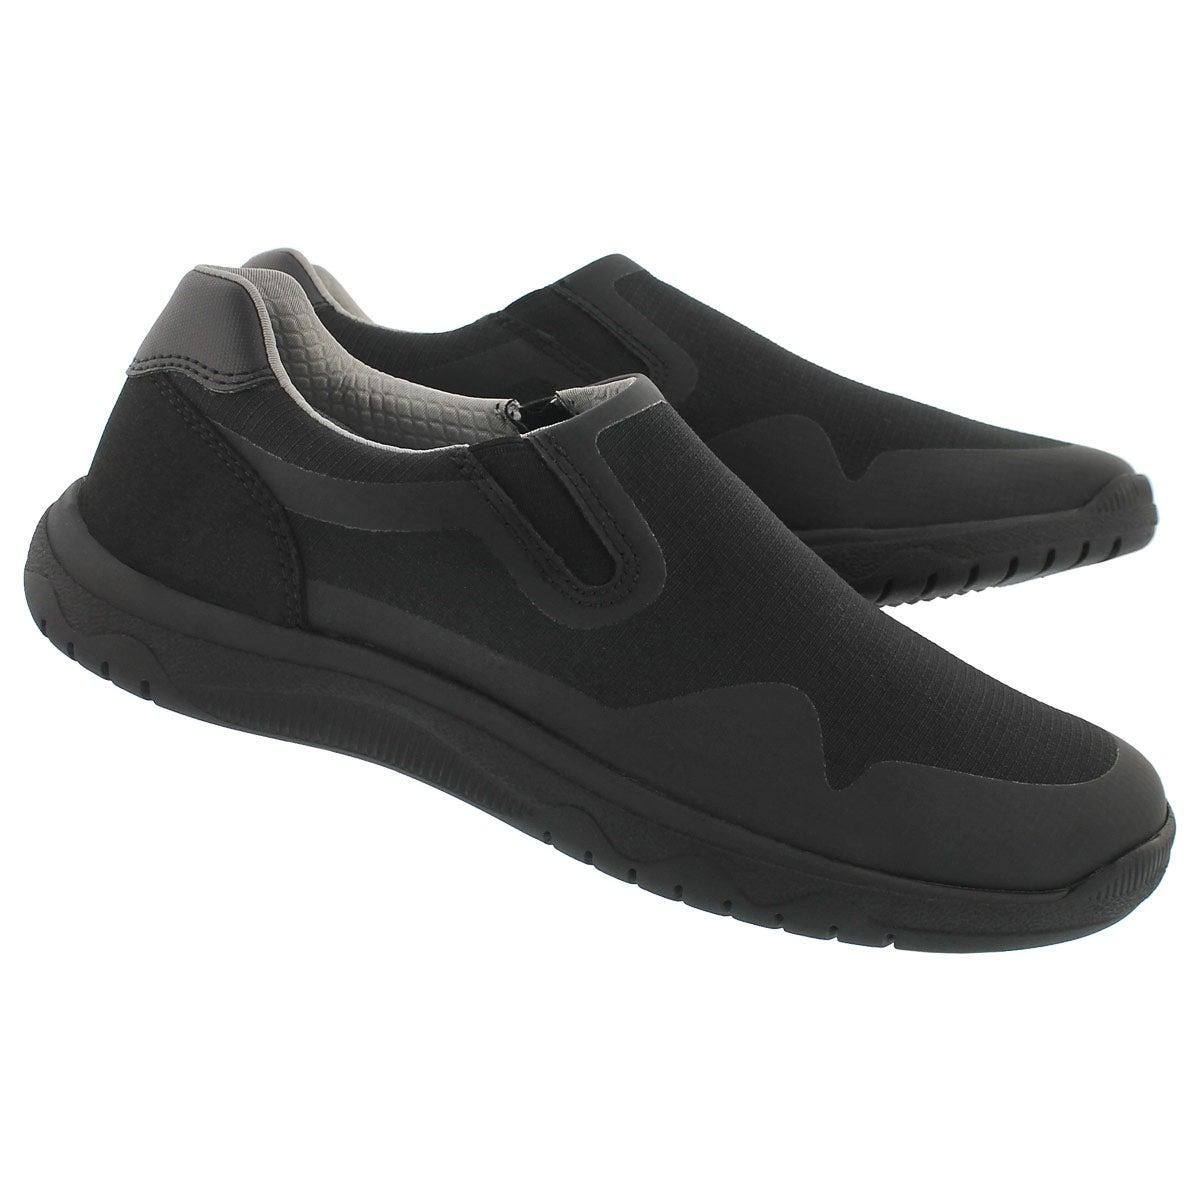 Mns Votta Free black casual slip on